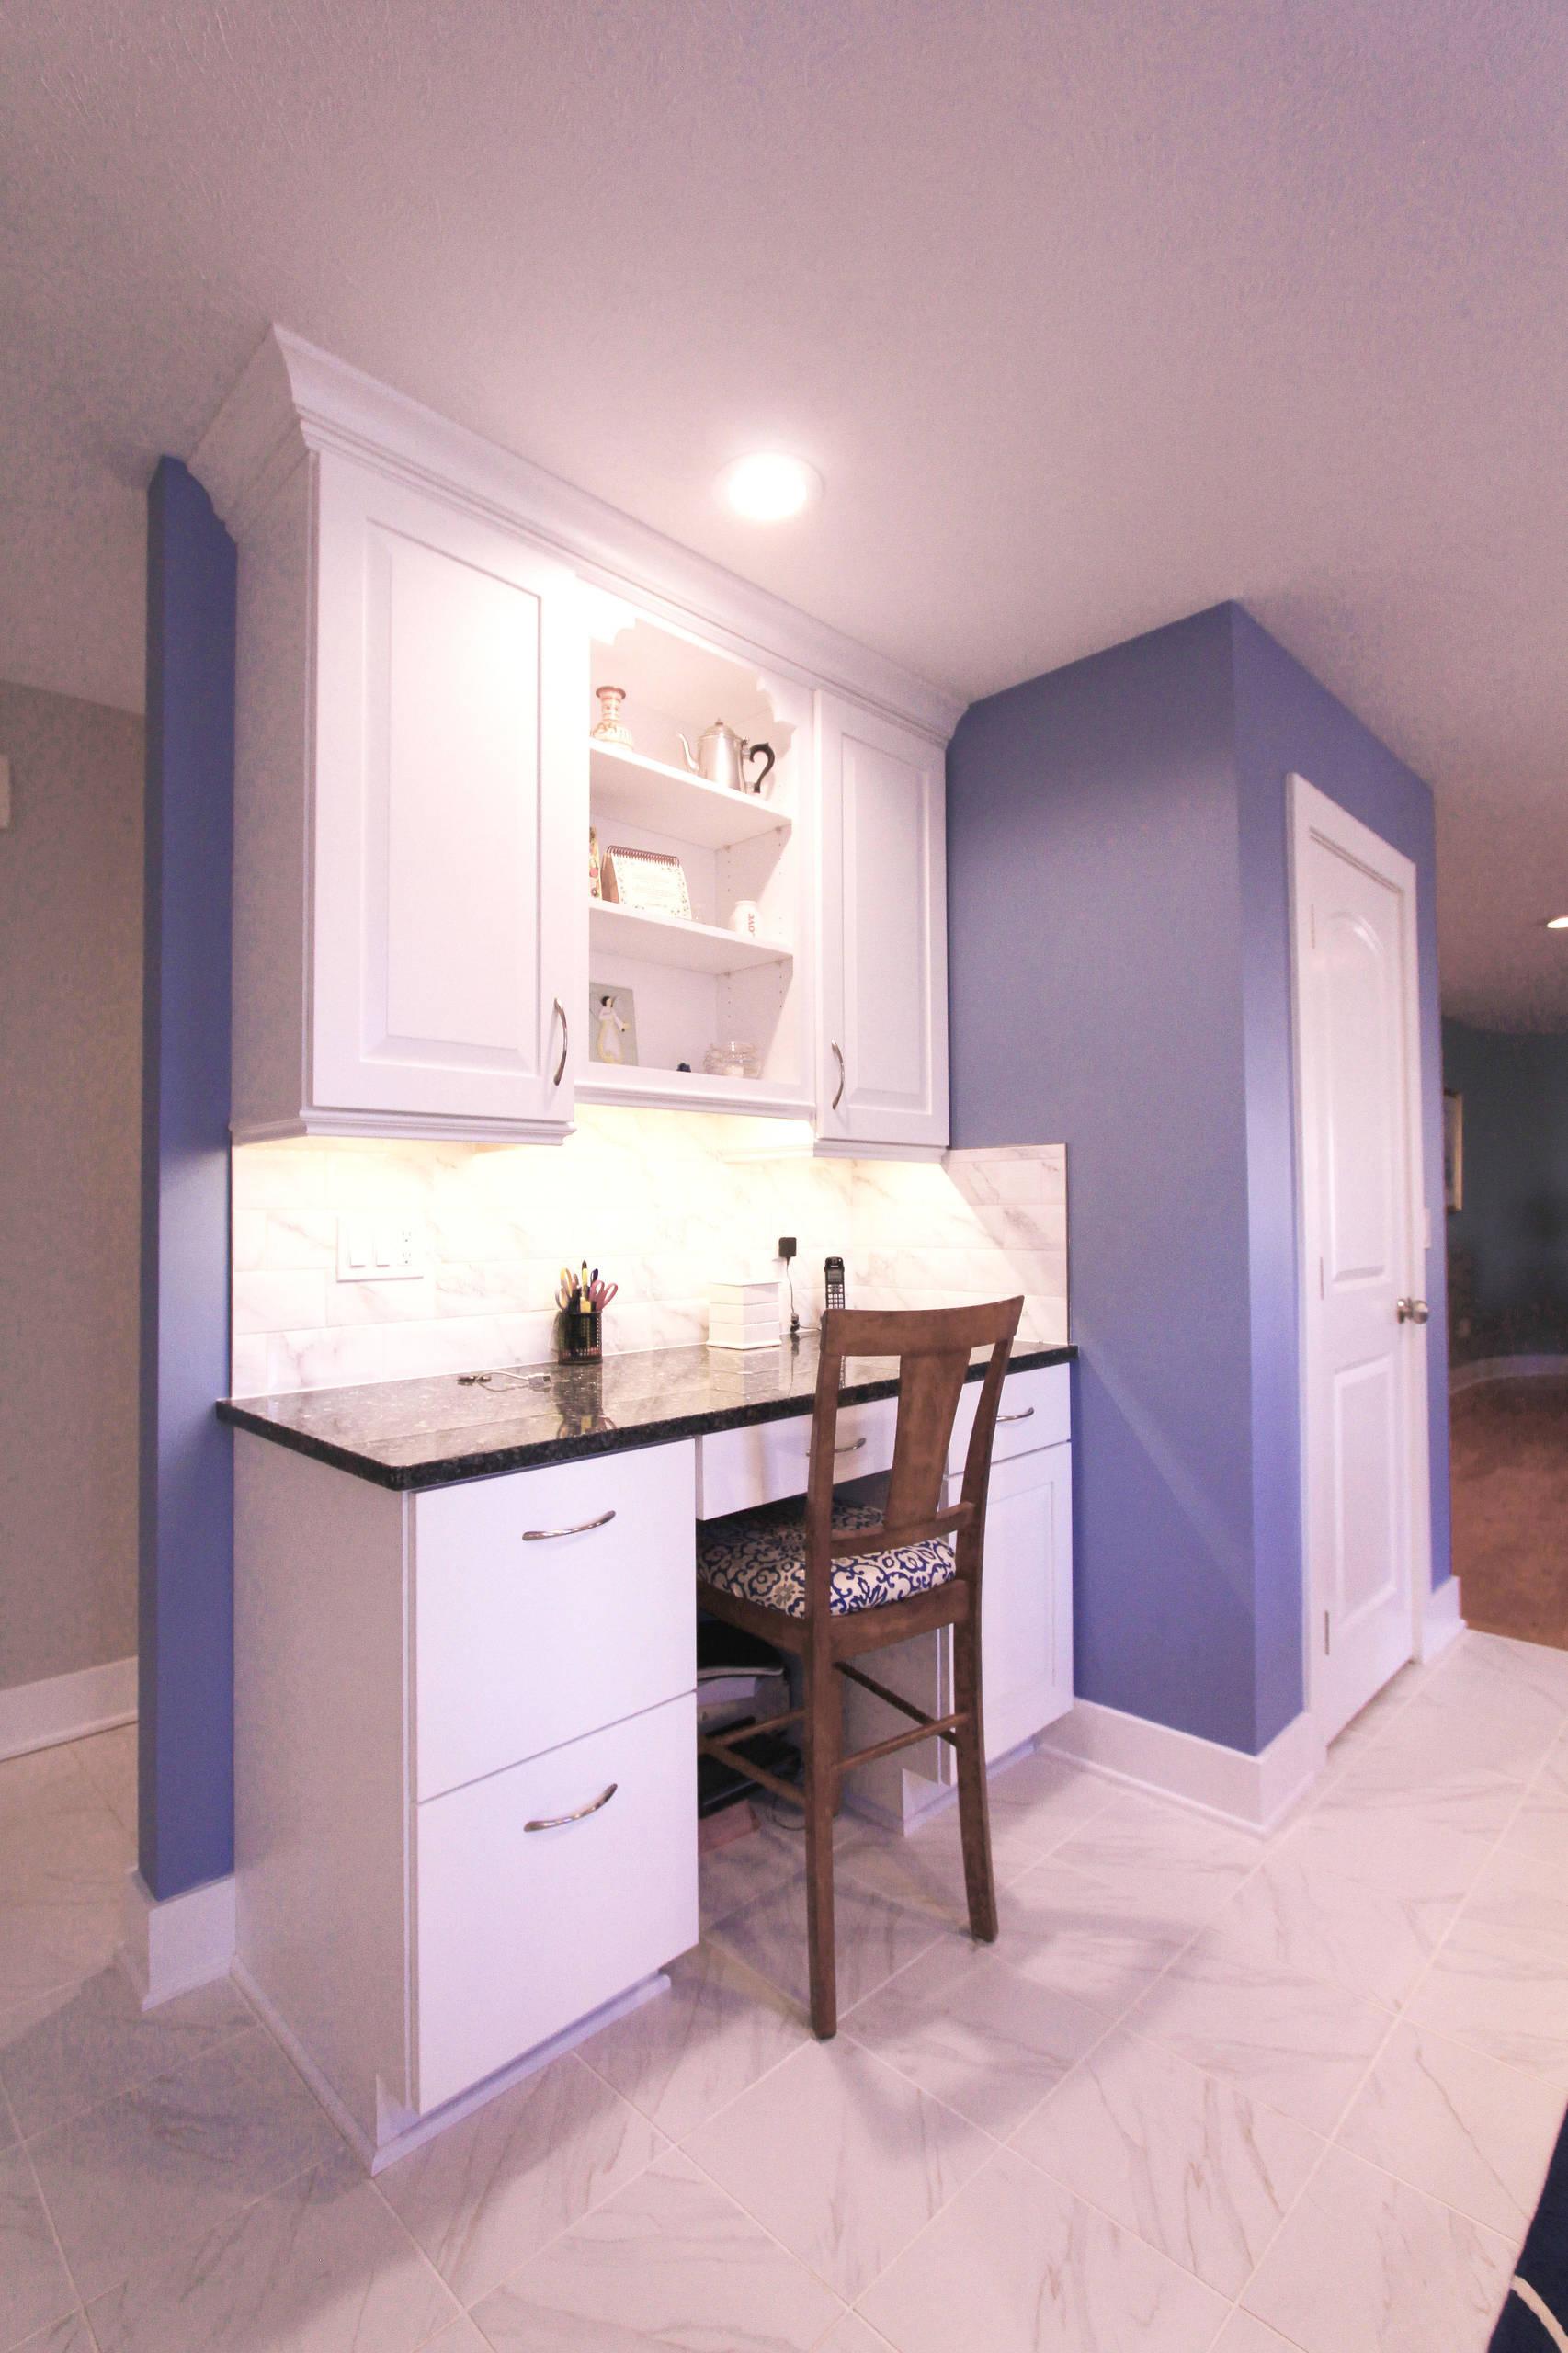 75 Beautiful Purple Marble Floor Kitchen Pictures Ideas December 2020 Houzz